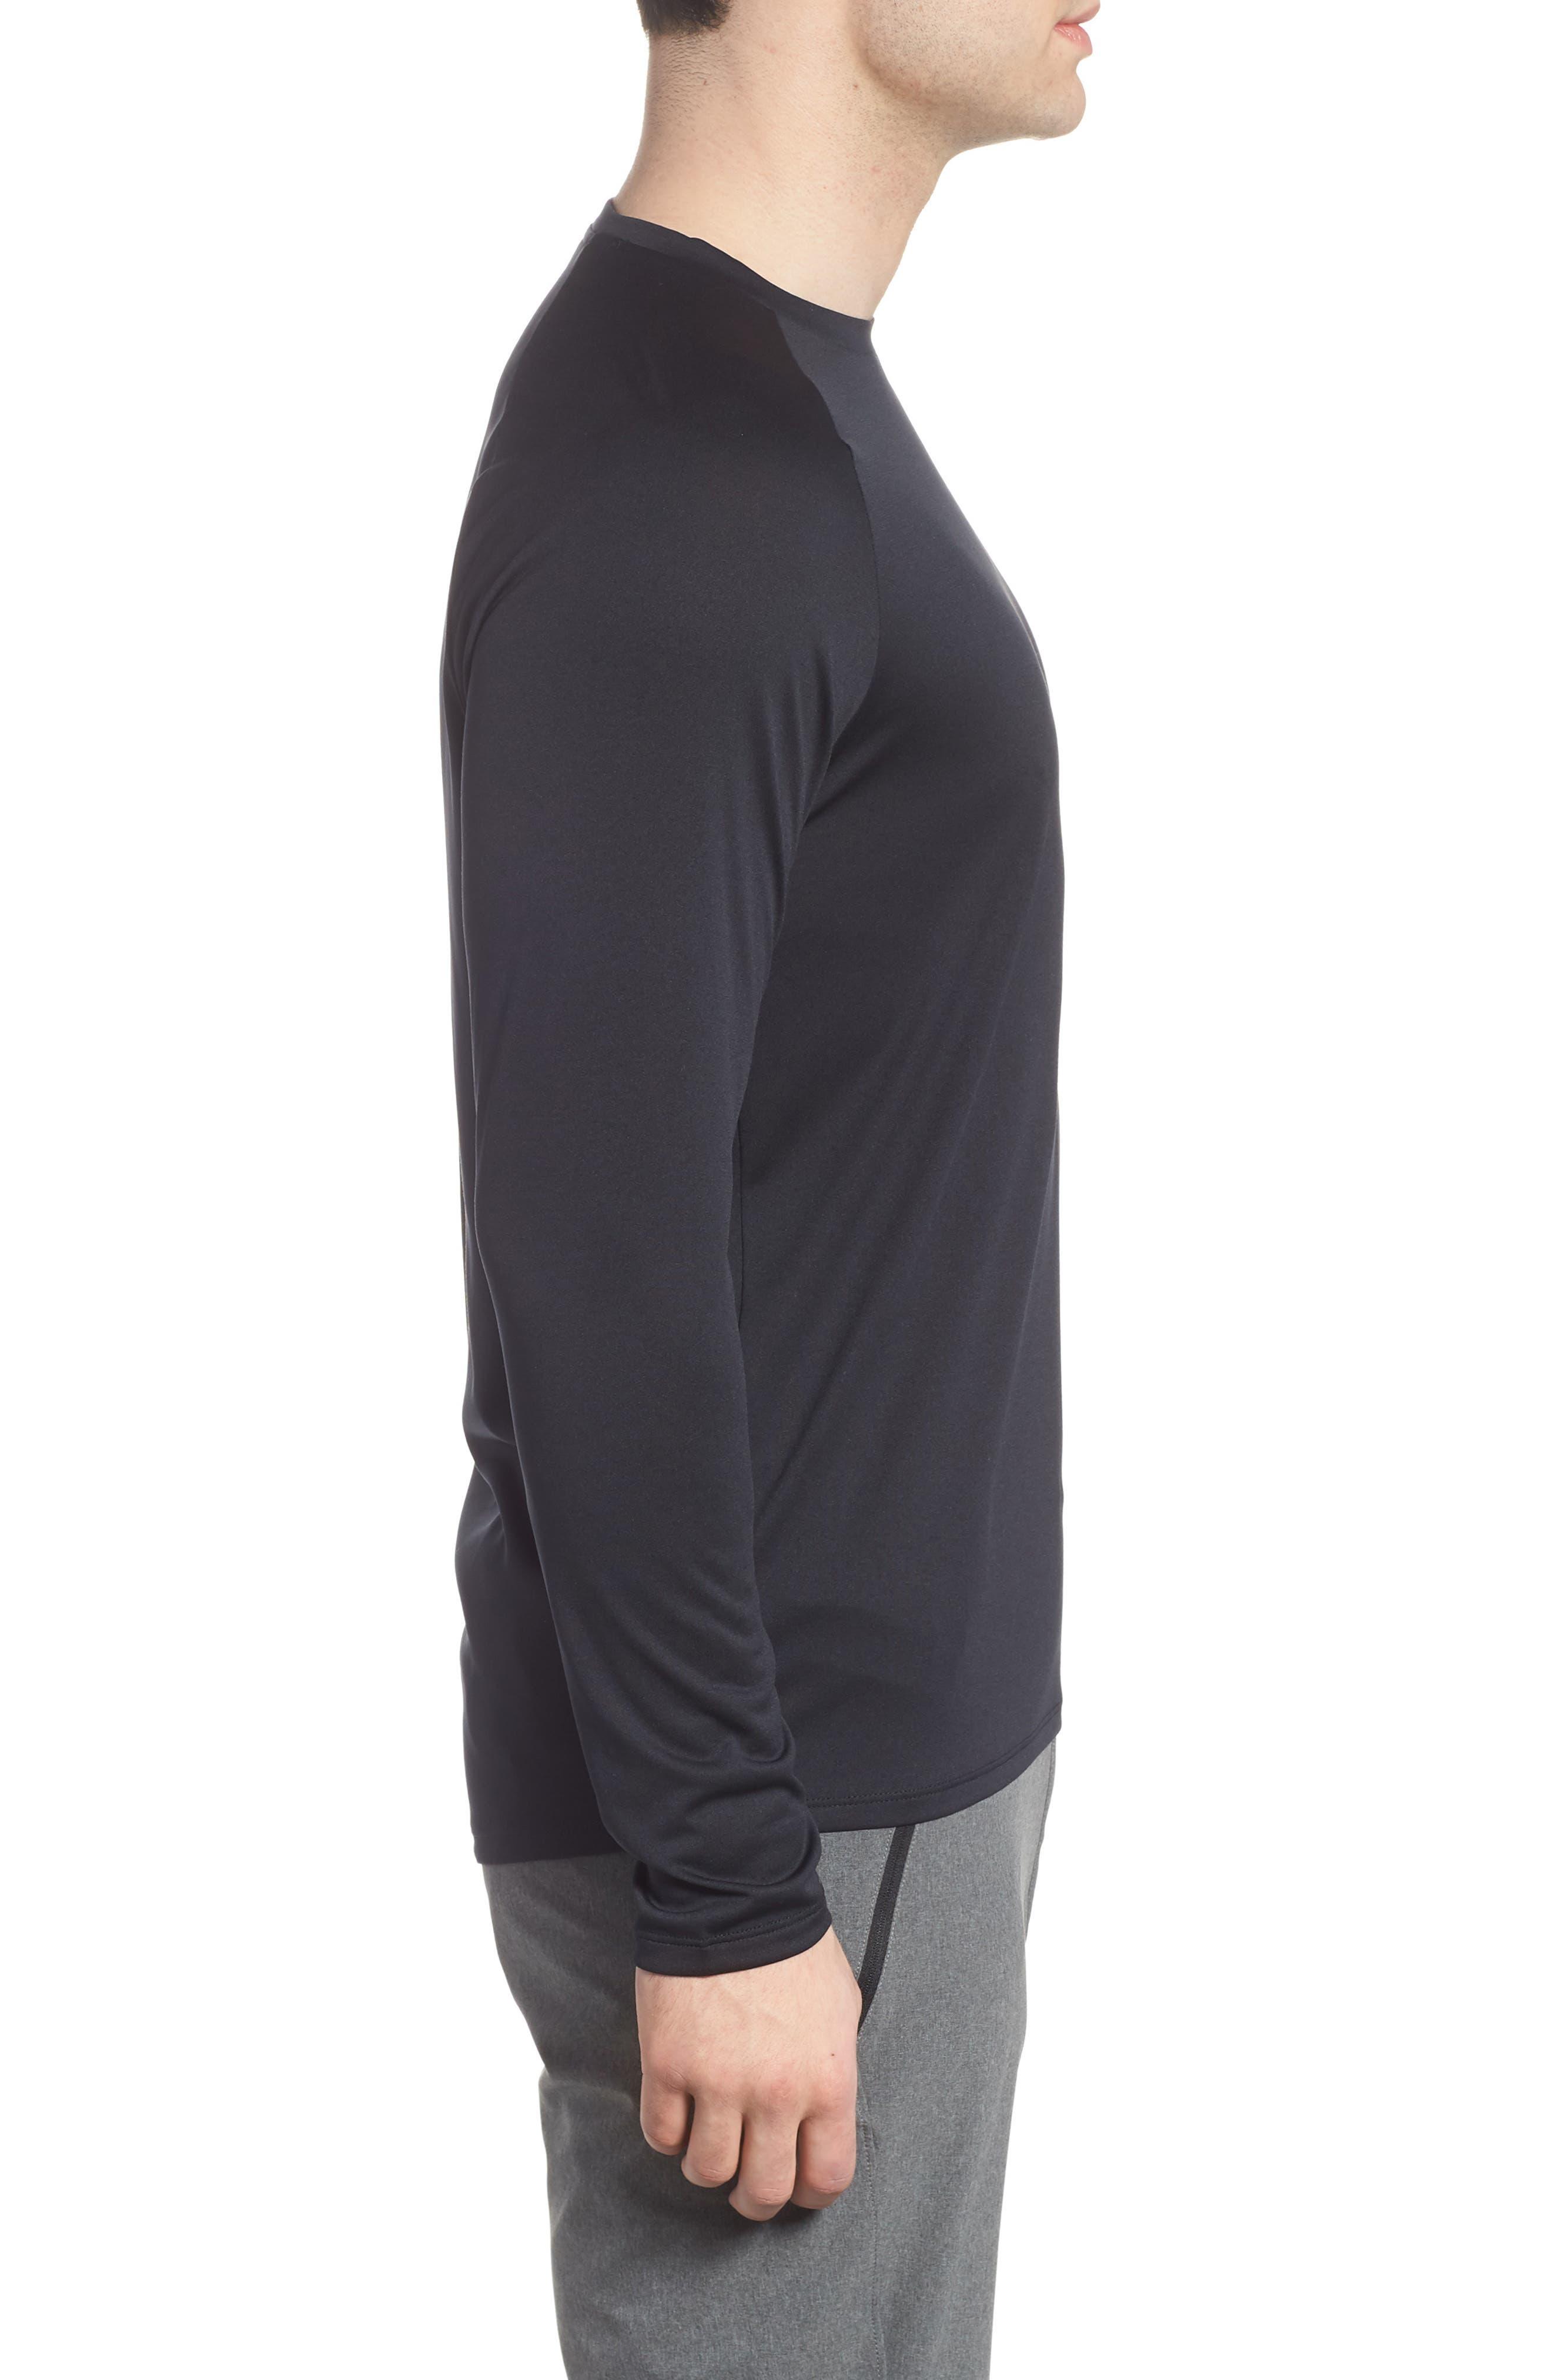 Performance Tech Long Sleeve Shirt,                             Alternate thumbnail 3, color,                             BLACK/ STEEL